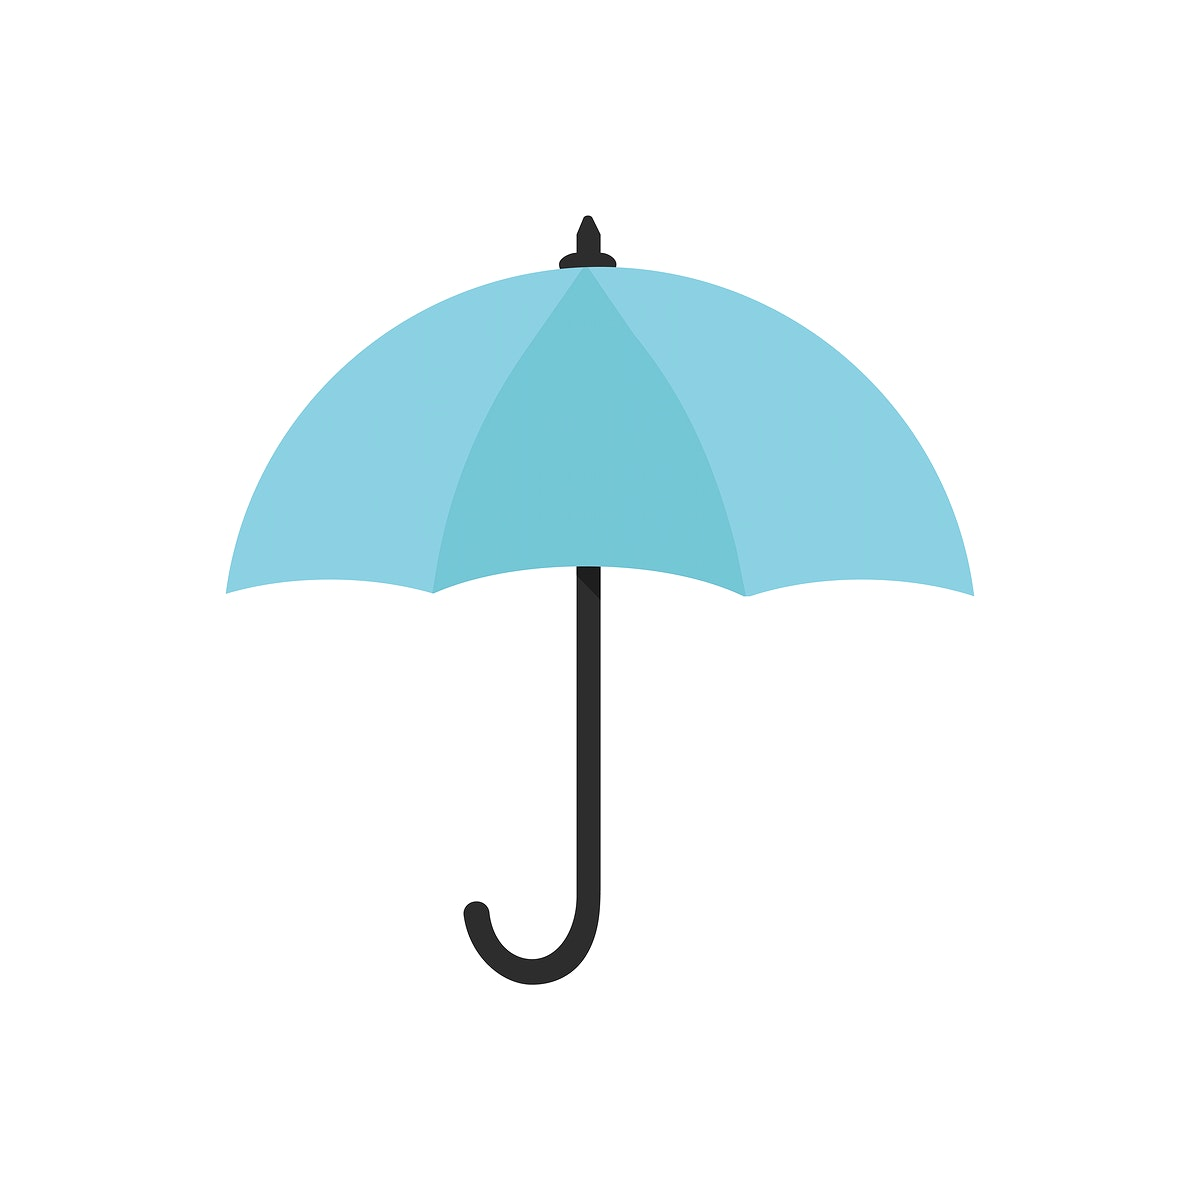 Blue umbrella icon isolated graphic illustration